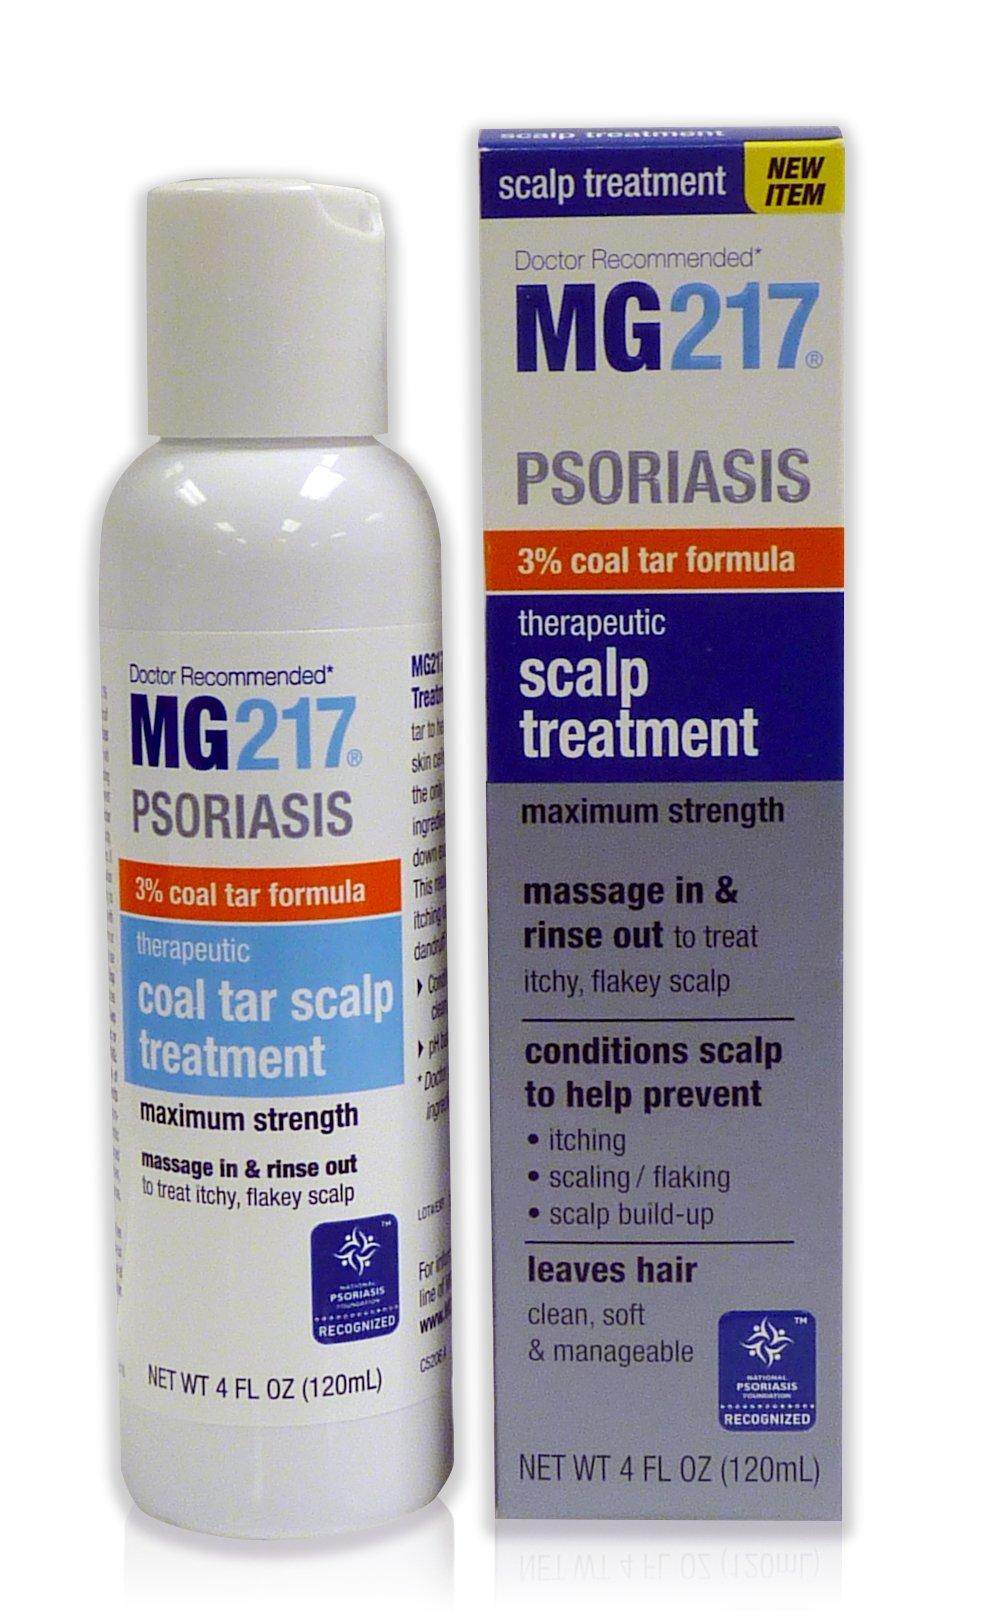 MG217 Psoriasis 3% Coal Tar Therapeutic Scalp Treatment, 4 Fl Oz